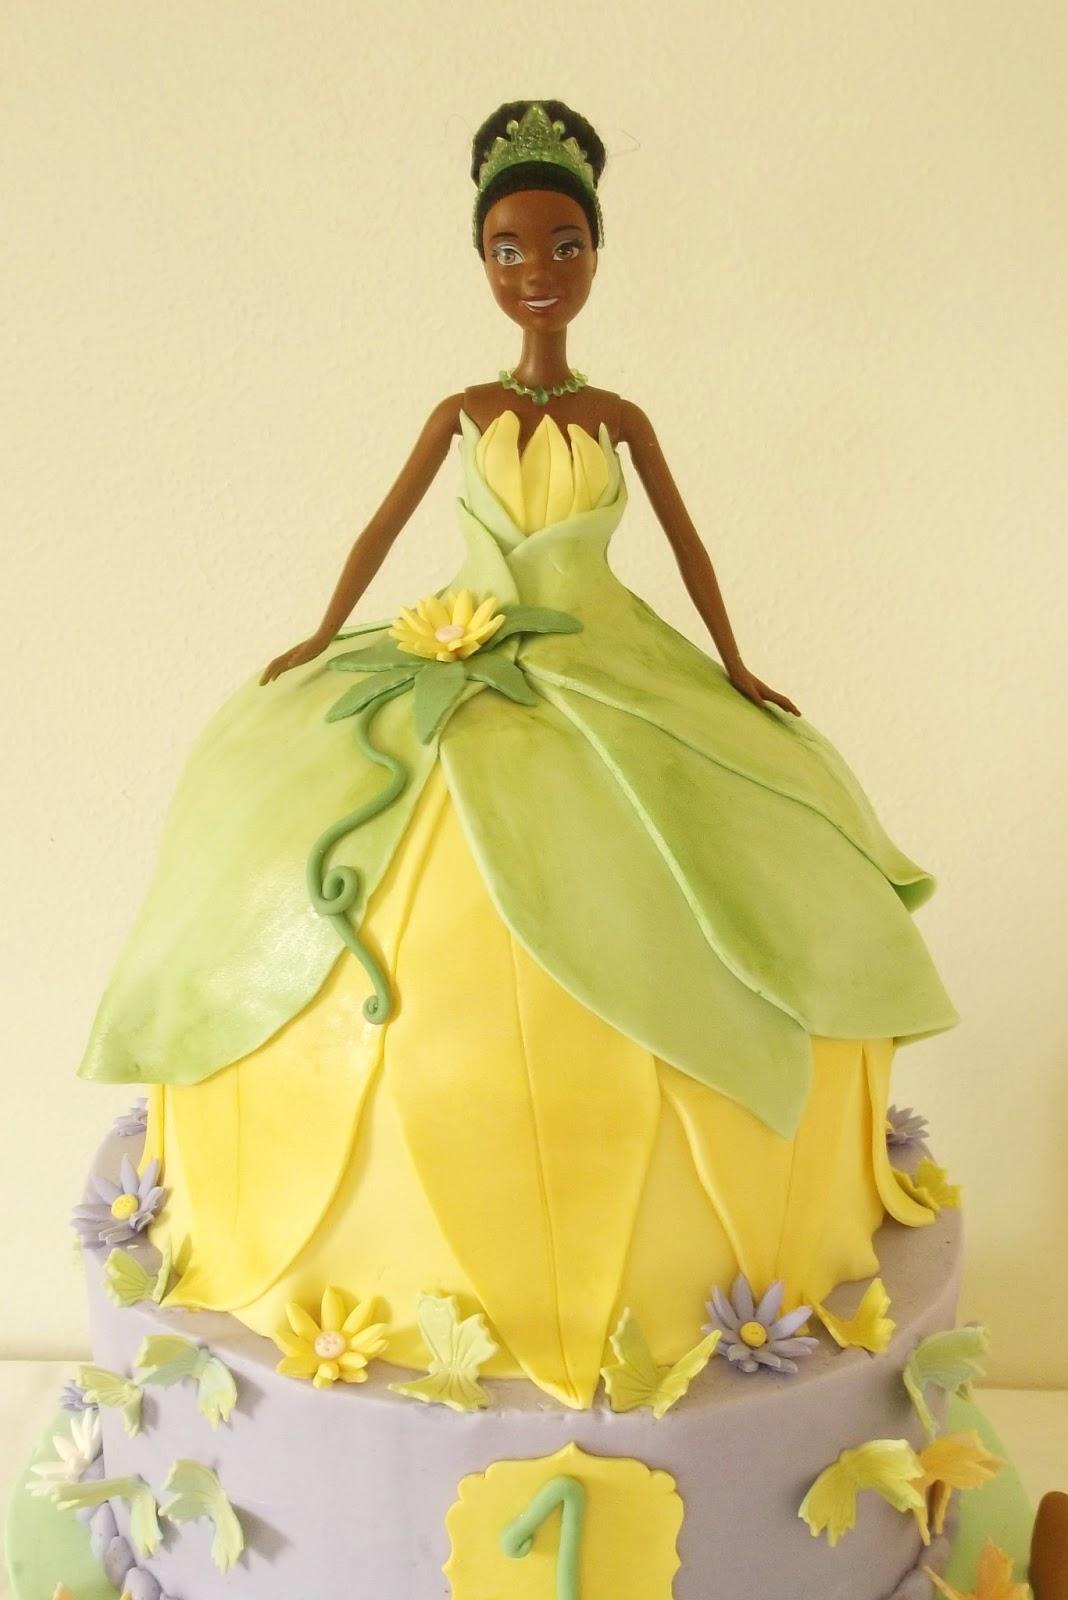 Boca Dulce Cakes Tiana Cake